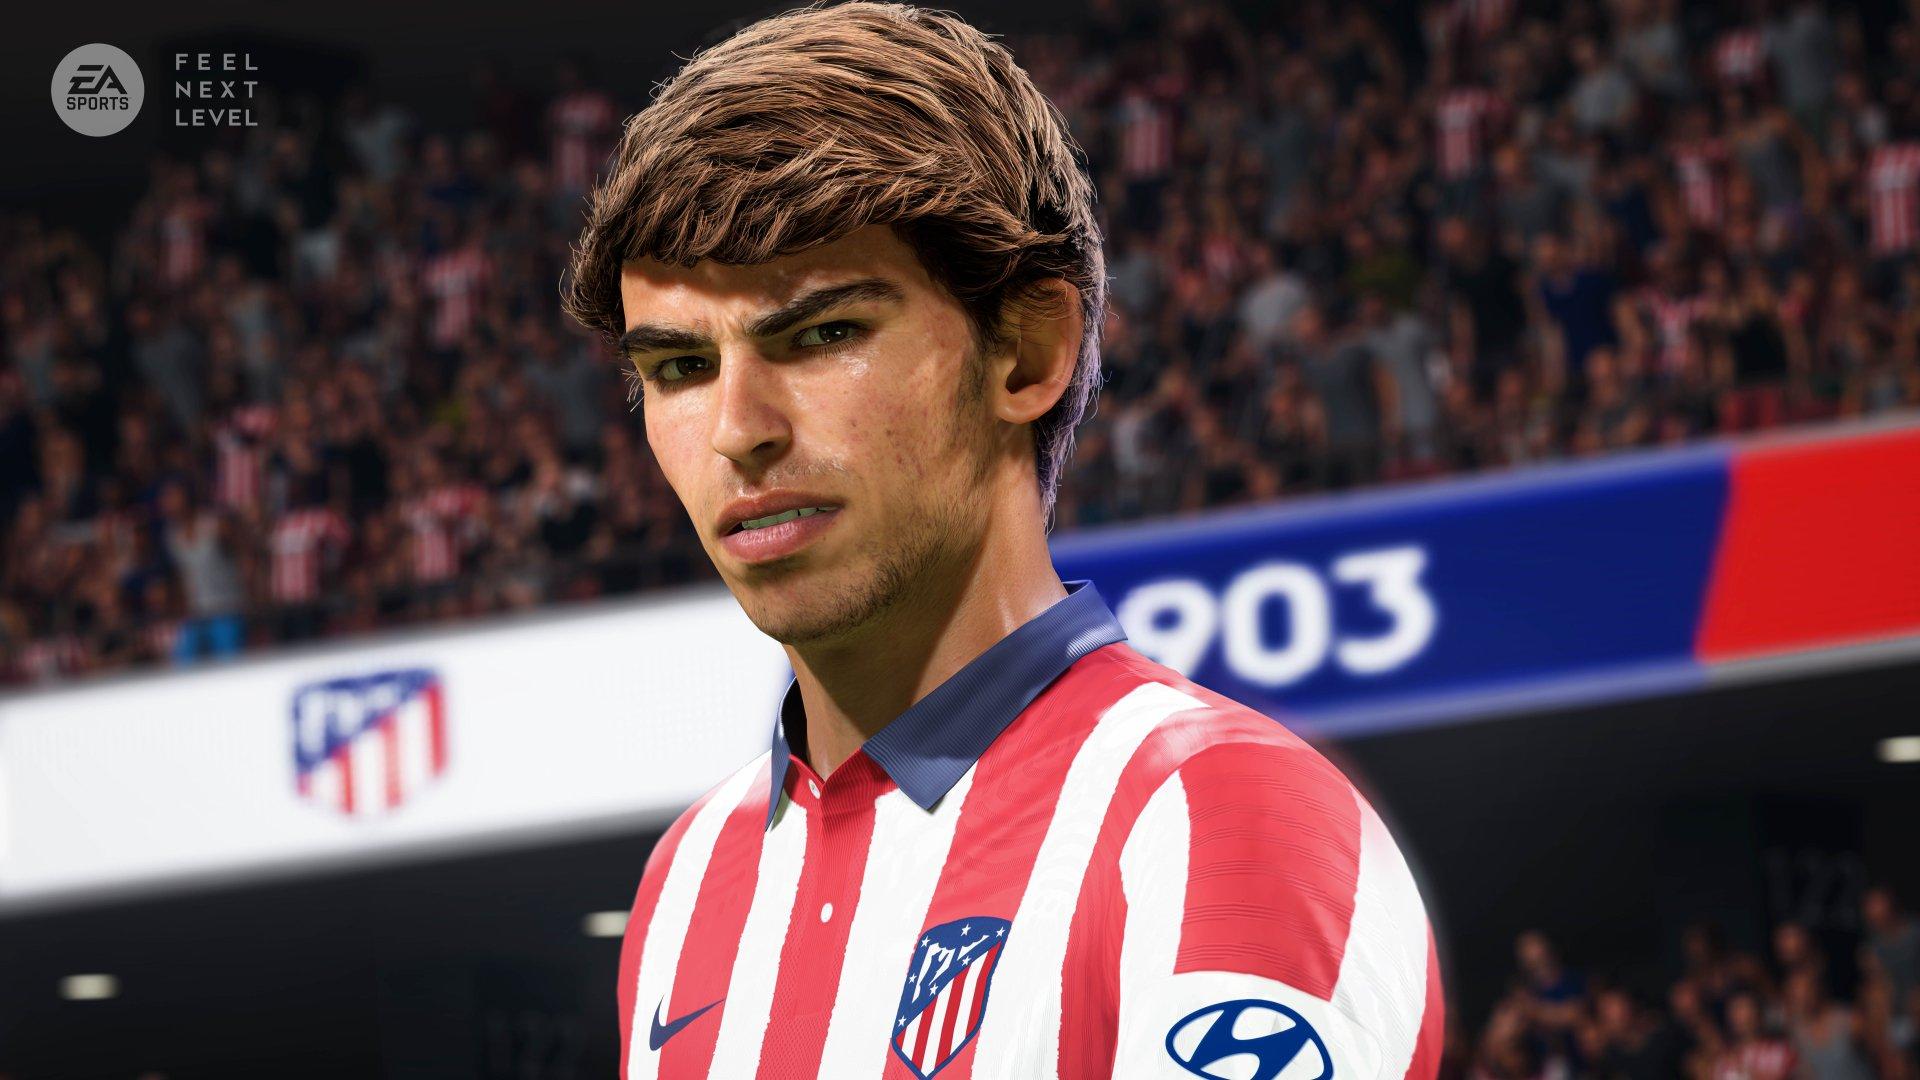 FIFA 21 HD Wallpaper | Background Image | 3840x2159 | ID ...